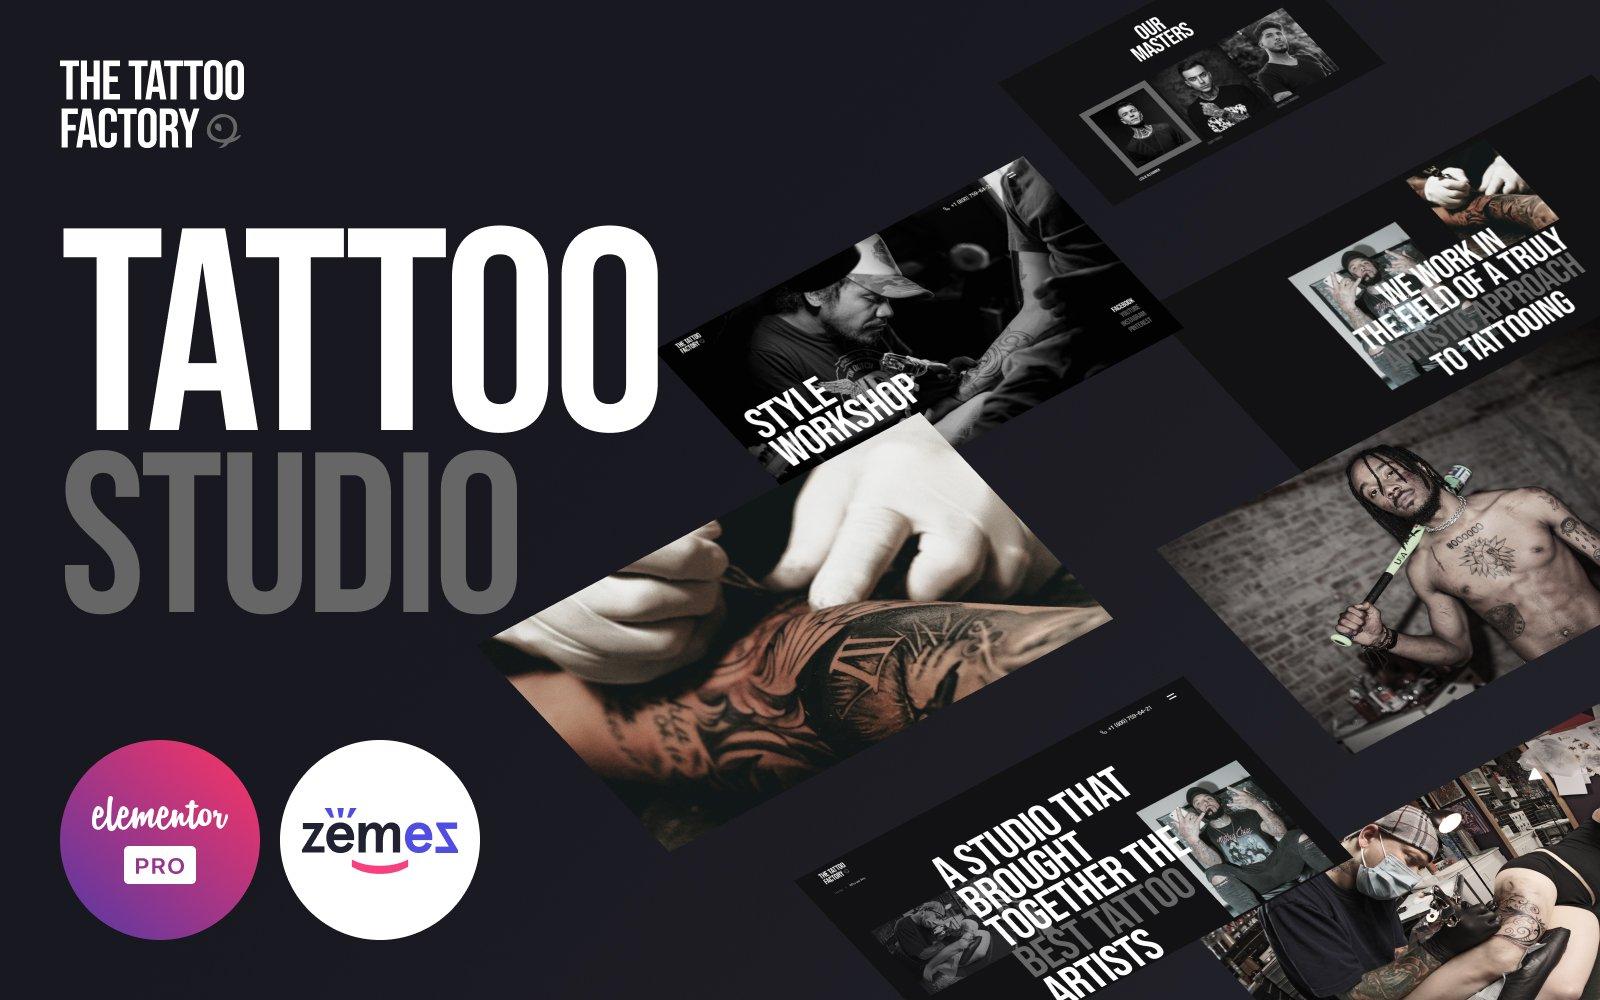 The Tattoo Factory - Elementor Pro Tattoo Studio №126444